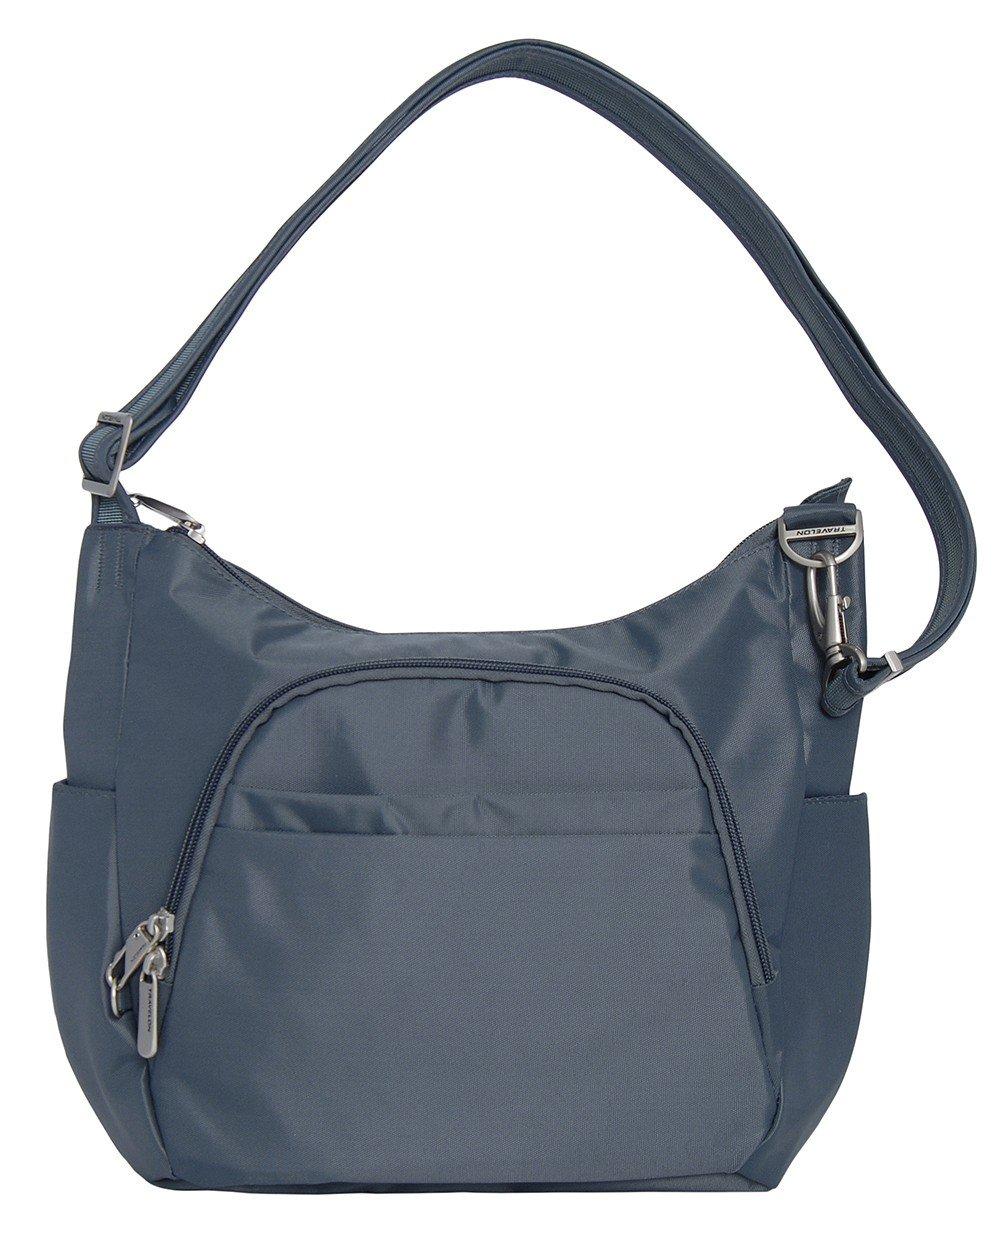 Travelon Anti-Theft Classic Crossbody Bucket Bag (One Size, DARK GREY w/CORAL Lining)